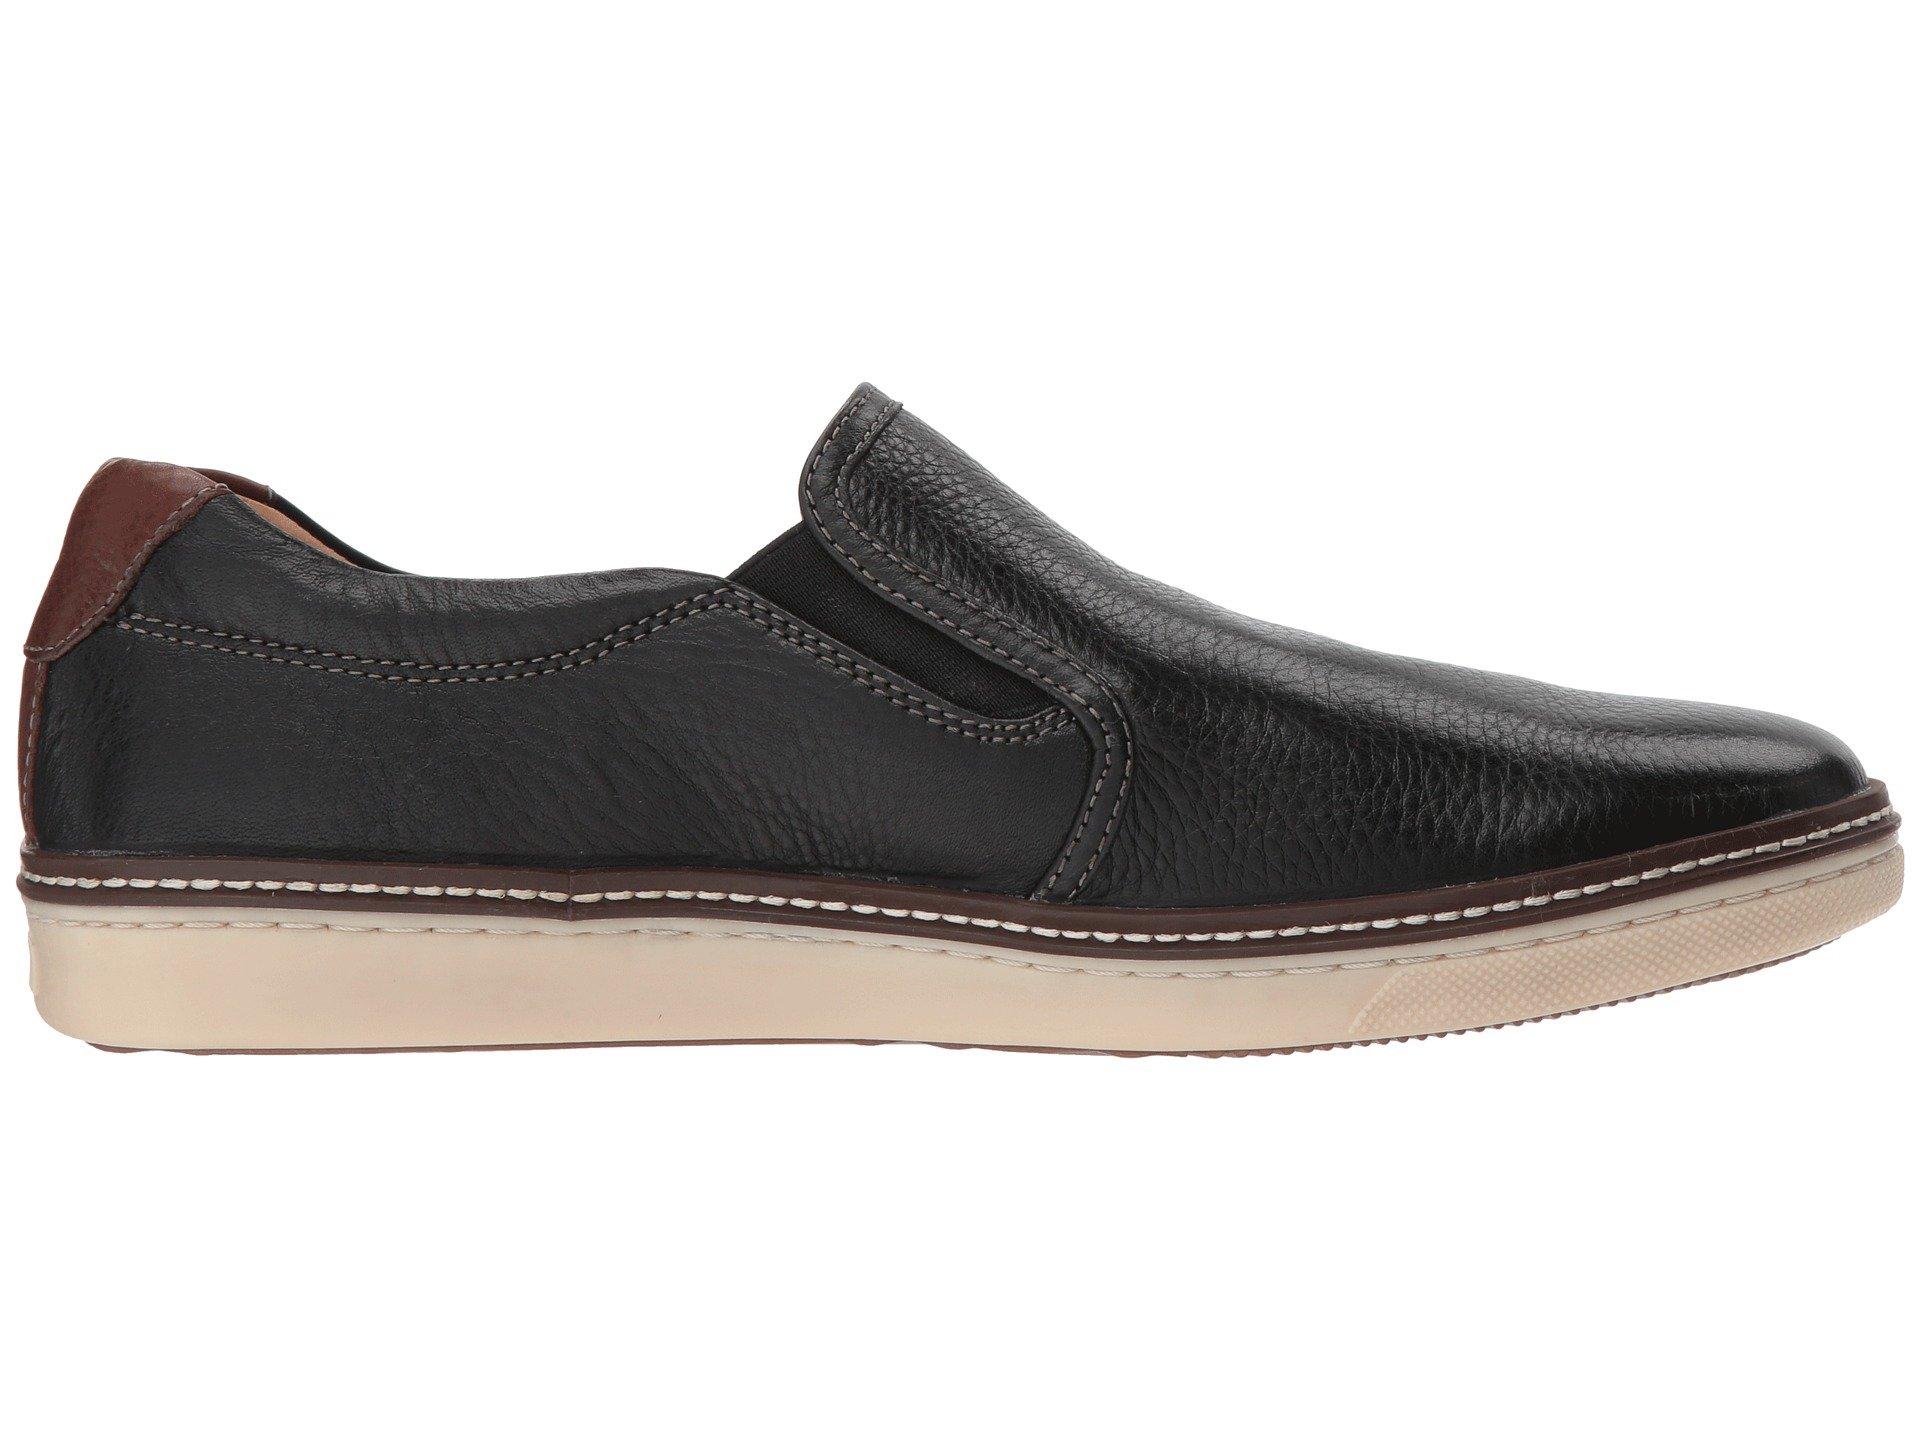 Casual amp; Full Grain on Sneaker 2 Mcguffey Murphy Black Slip Johnston wt7fdf